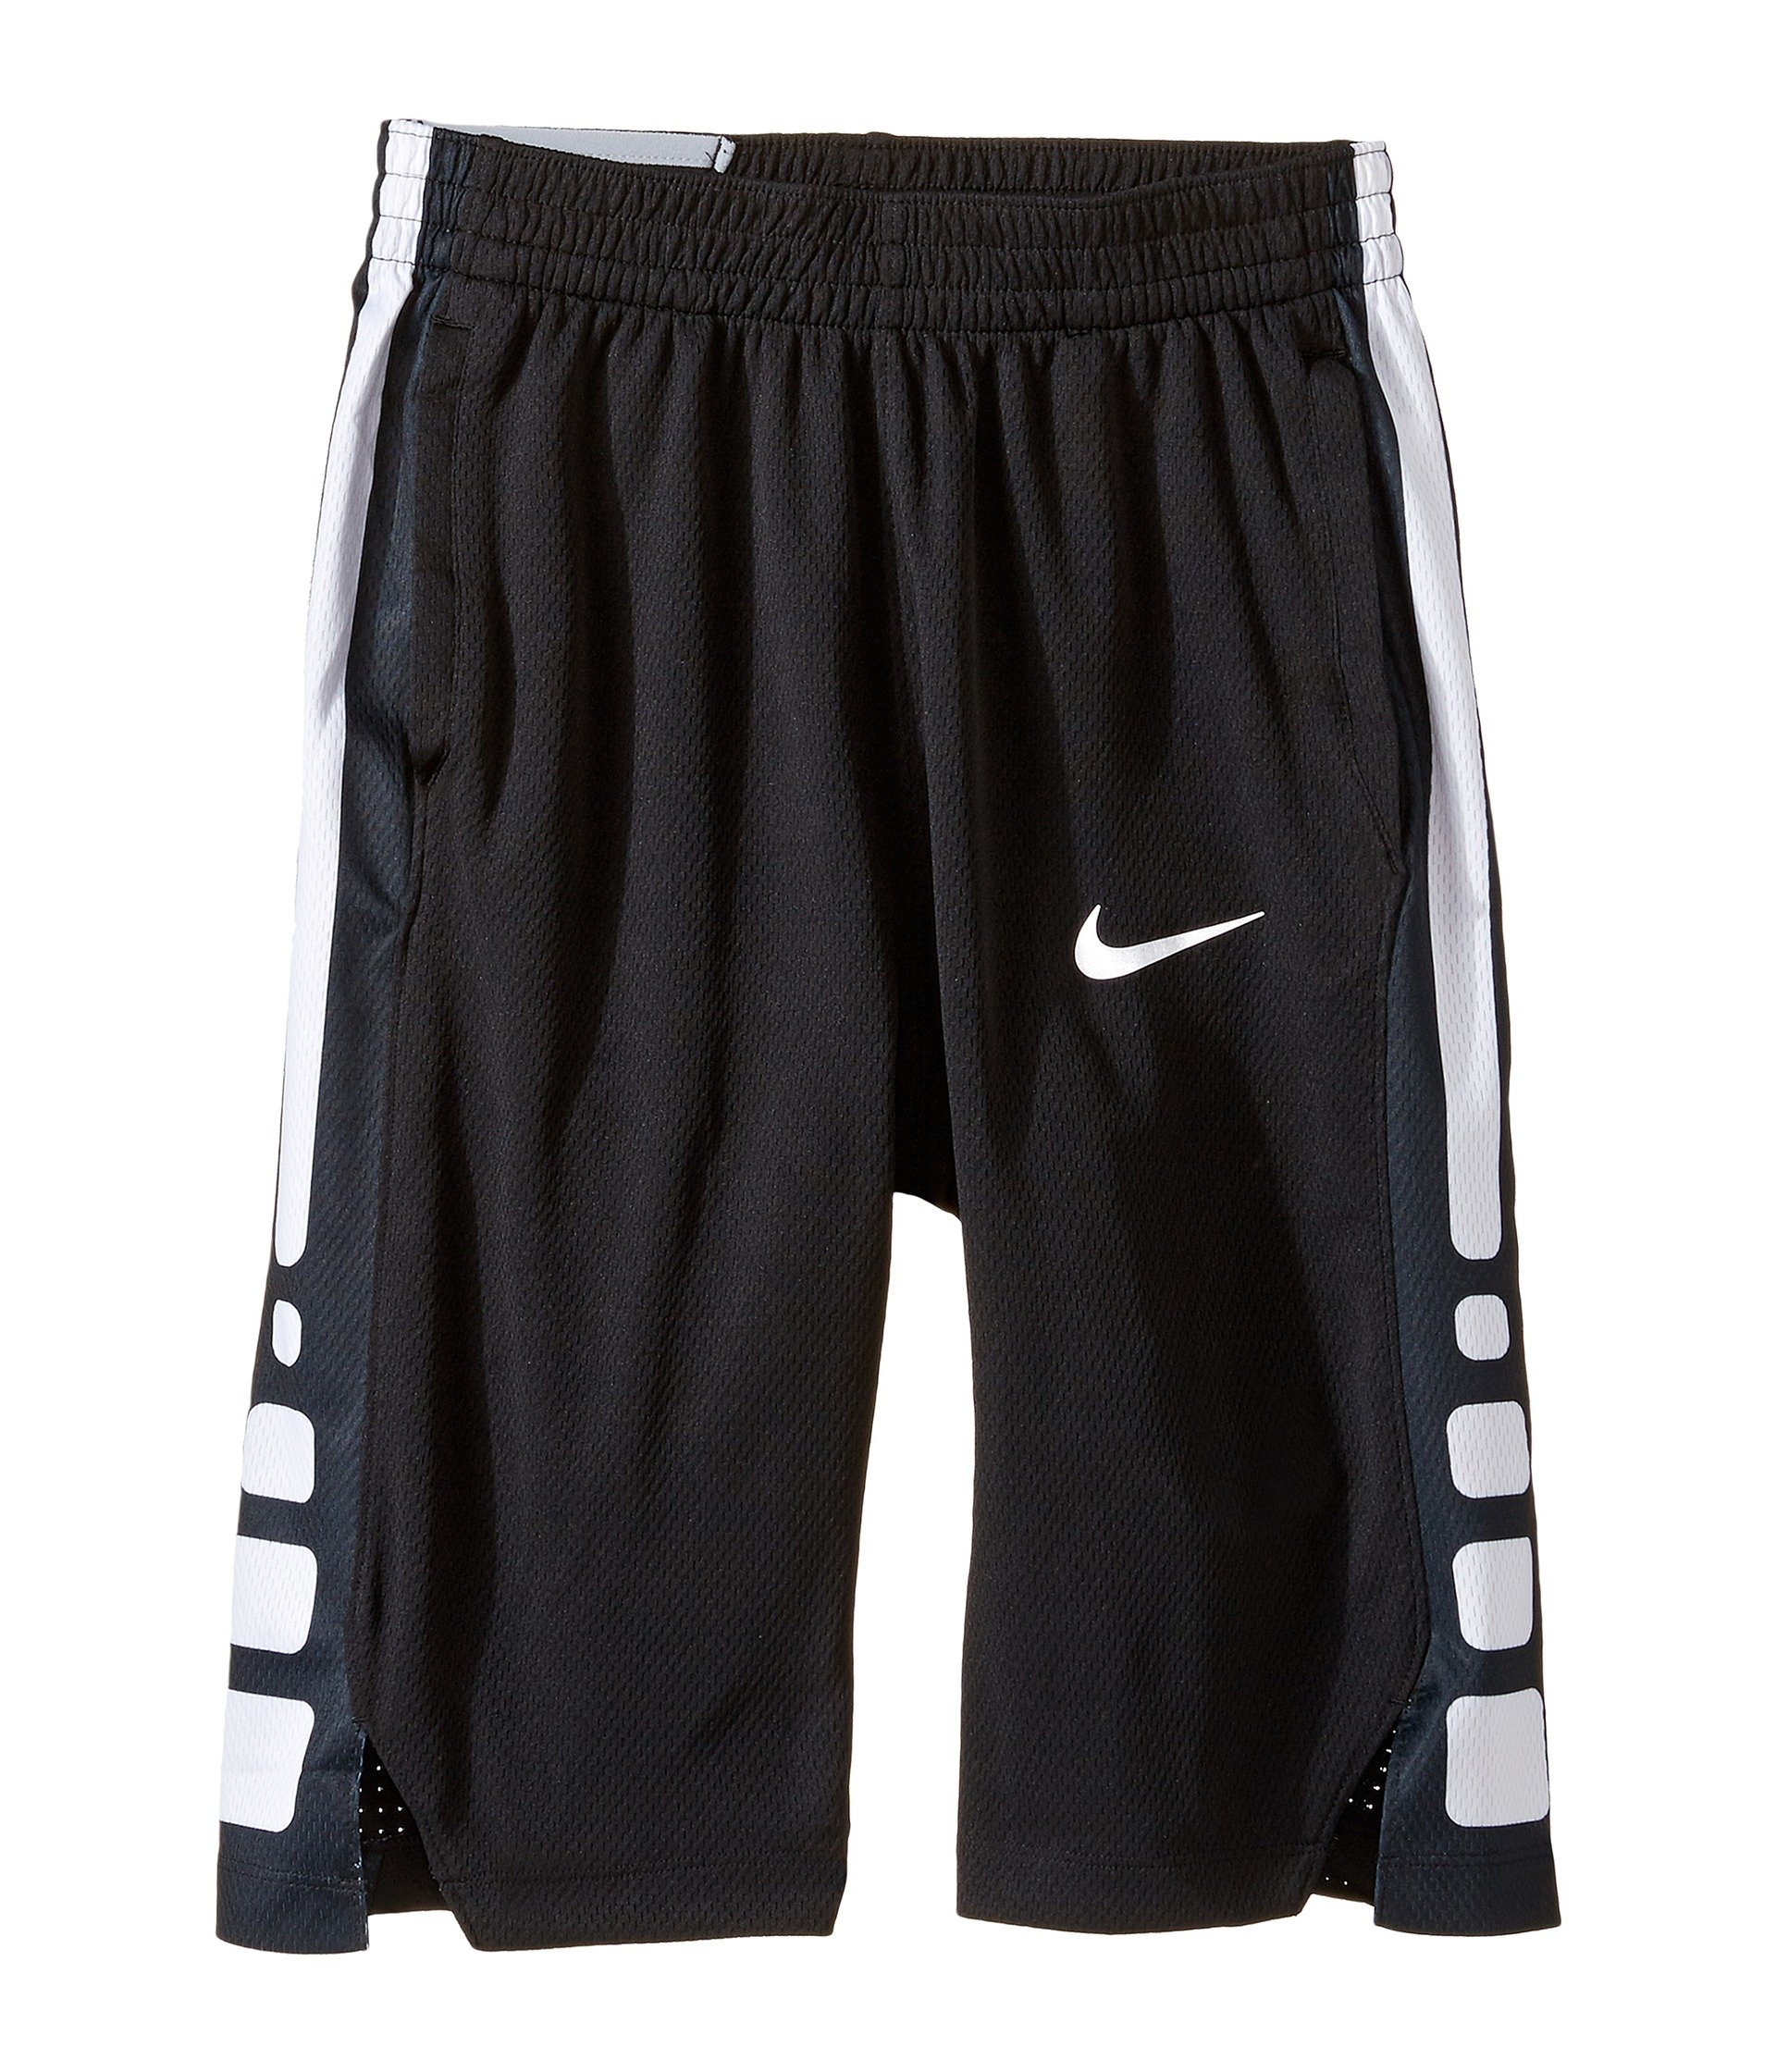 Nike Boy's Dry Basketball Short Black/White Size Small by Nike